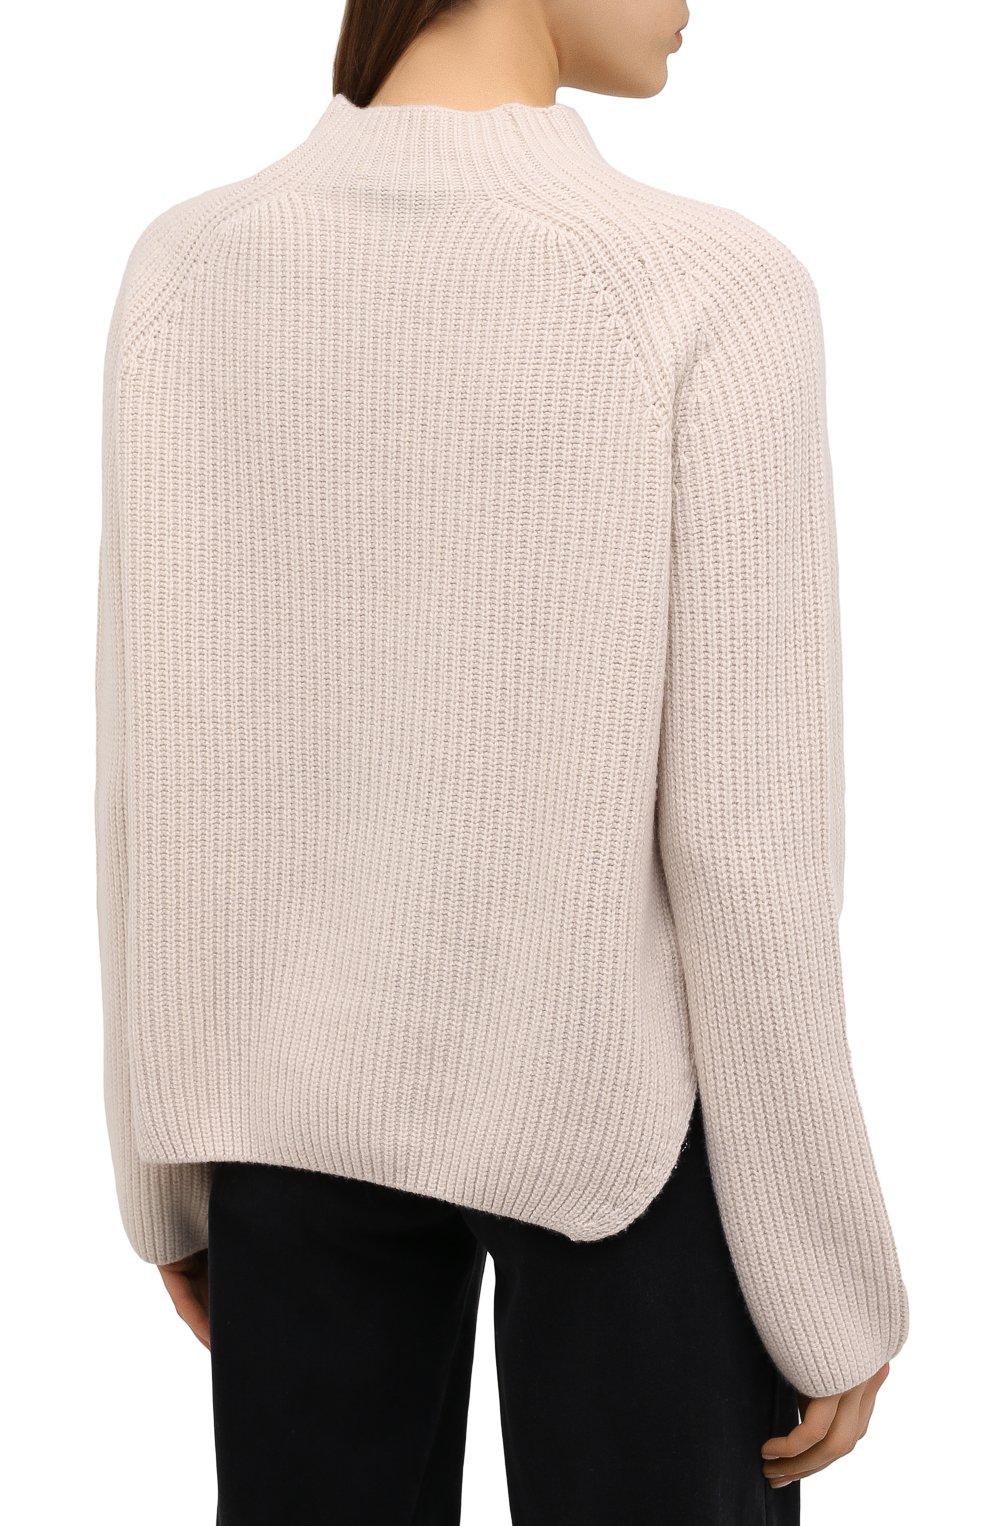 Женский свитер из шерсти и кашемира FORTE_FORTE светло-бежевого цвета, арт. 7845 | Фото 4